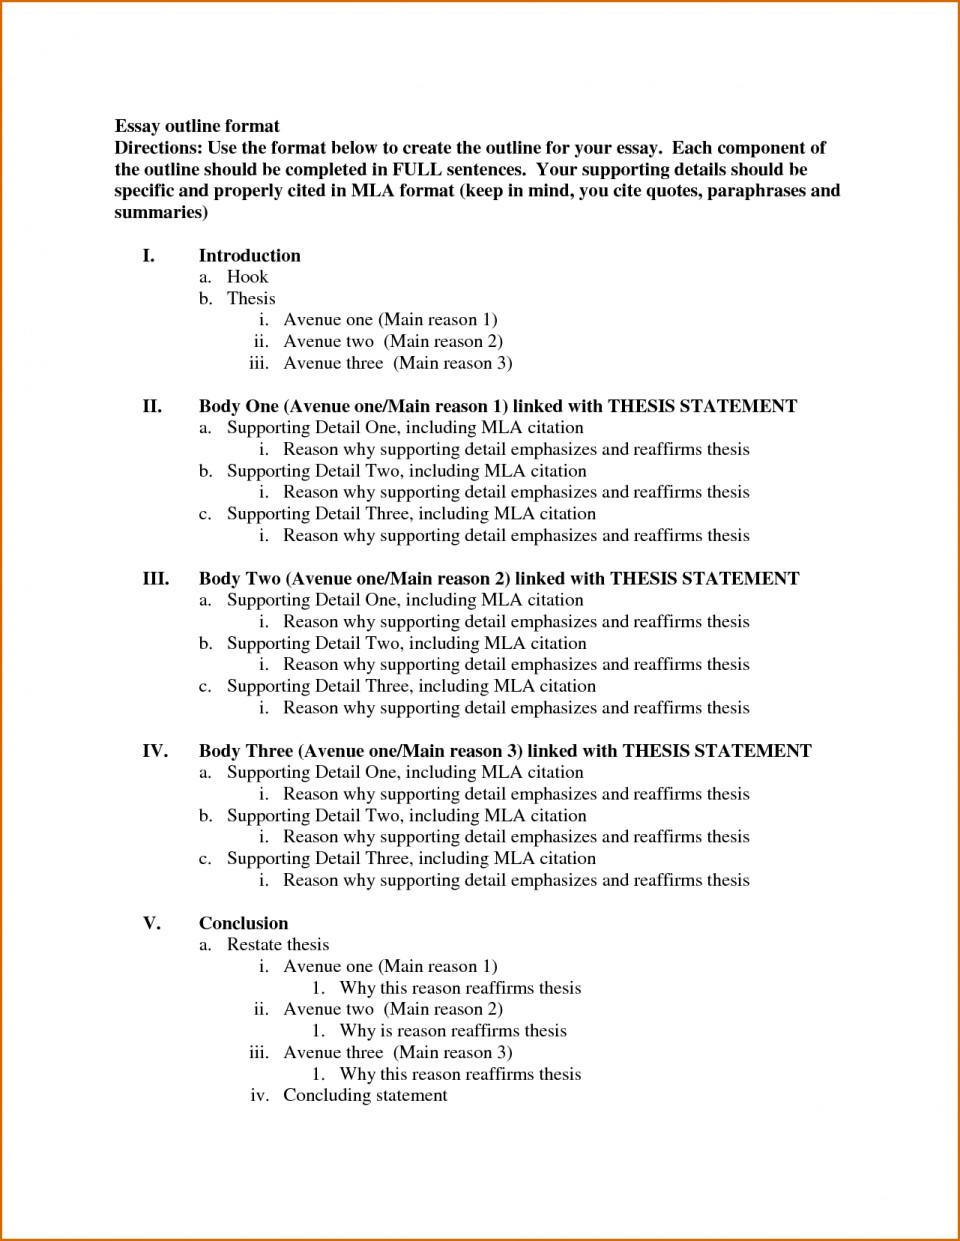 003 Essay Example Outline Template How To Do An Astounding For Write A Formal Argumentative Create Persuasive Make Informative 960